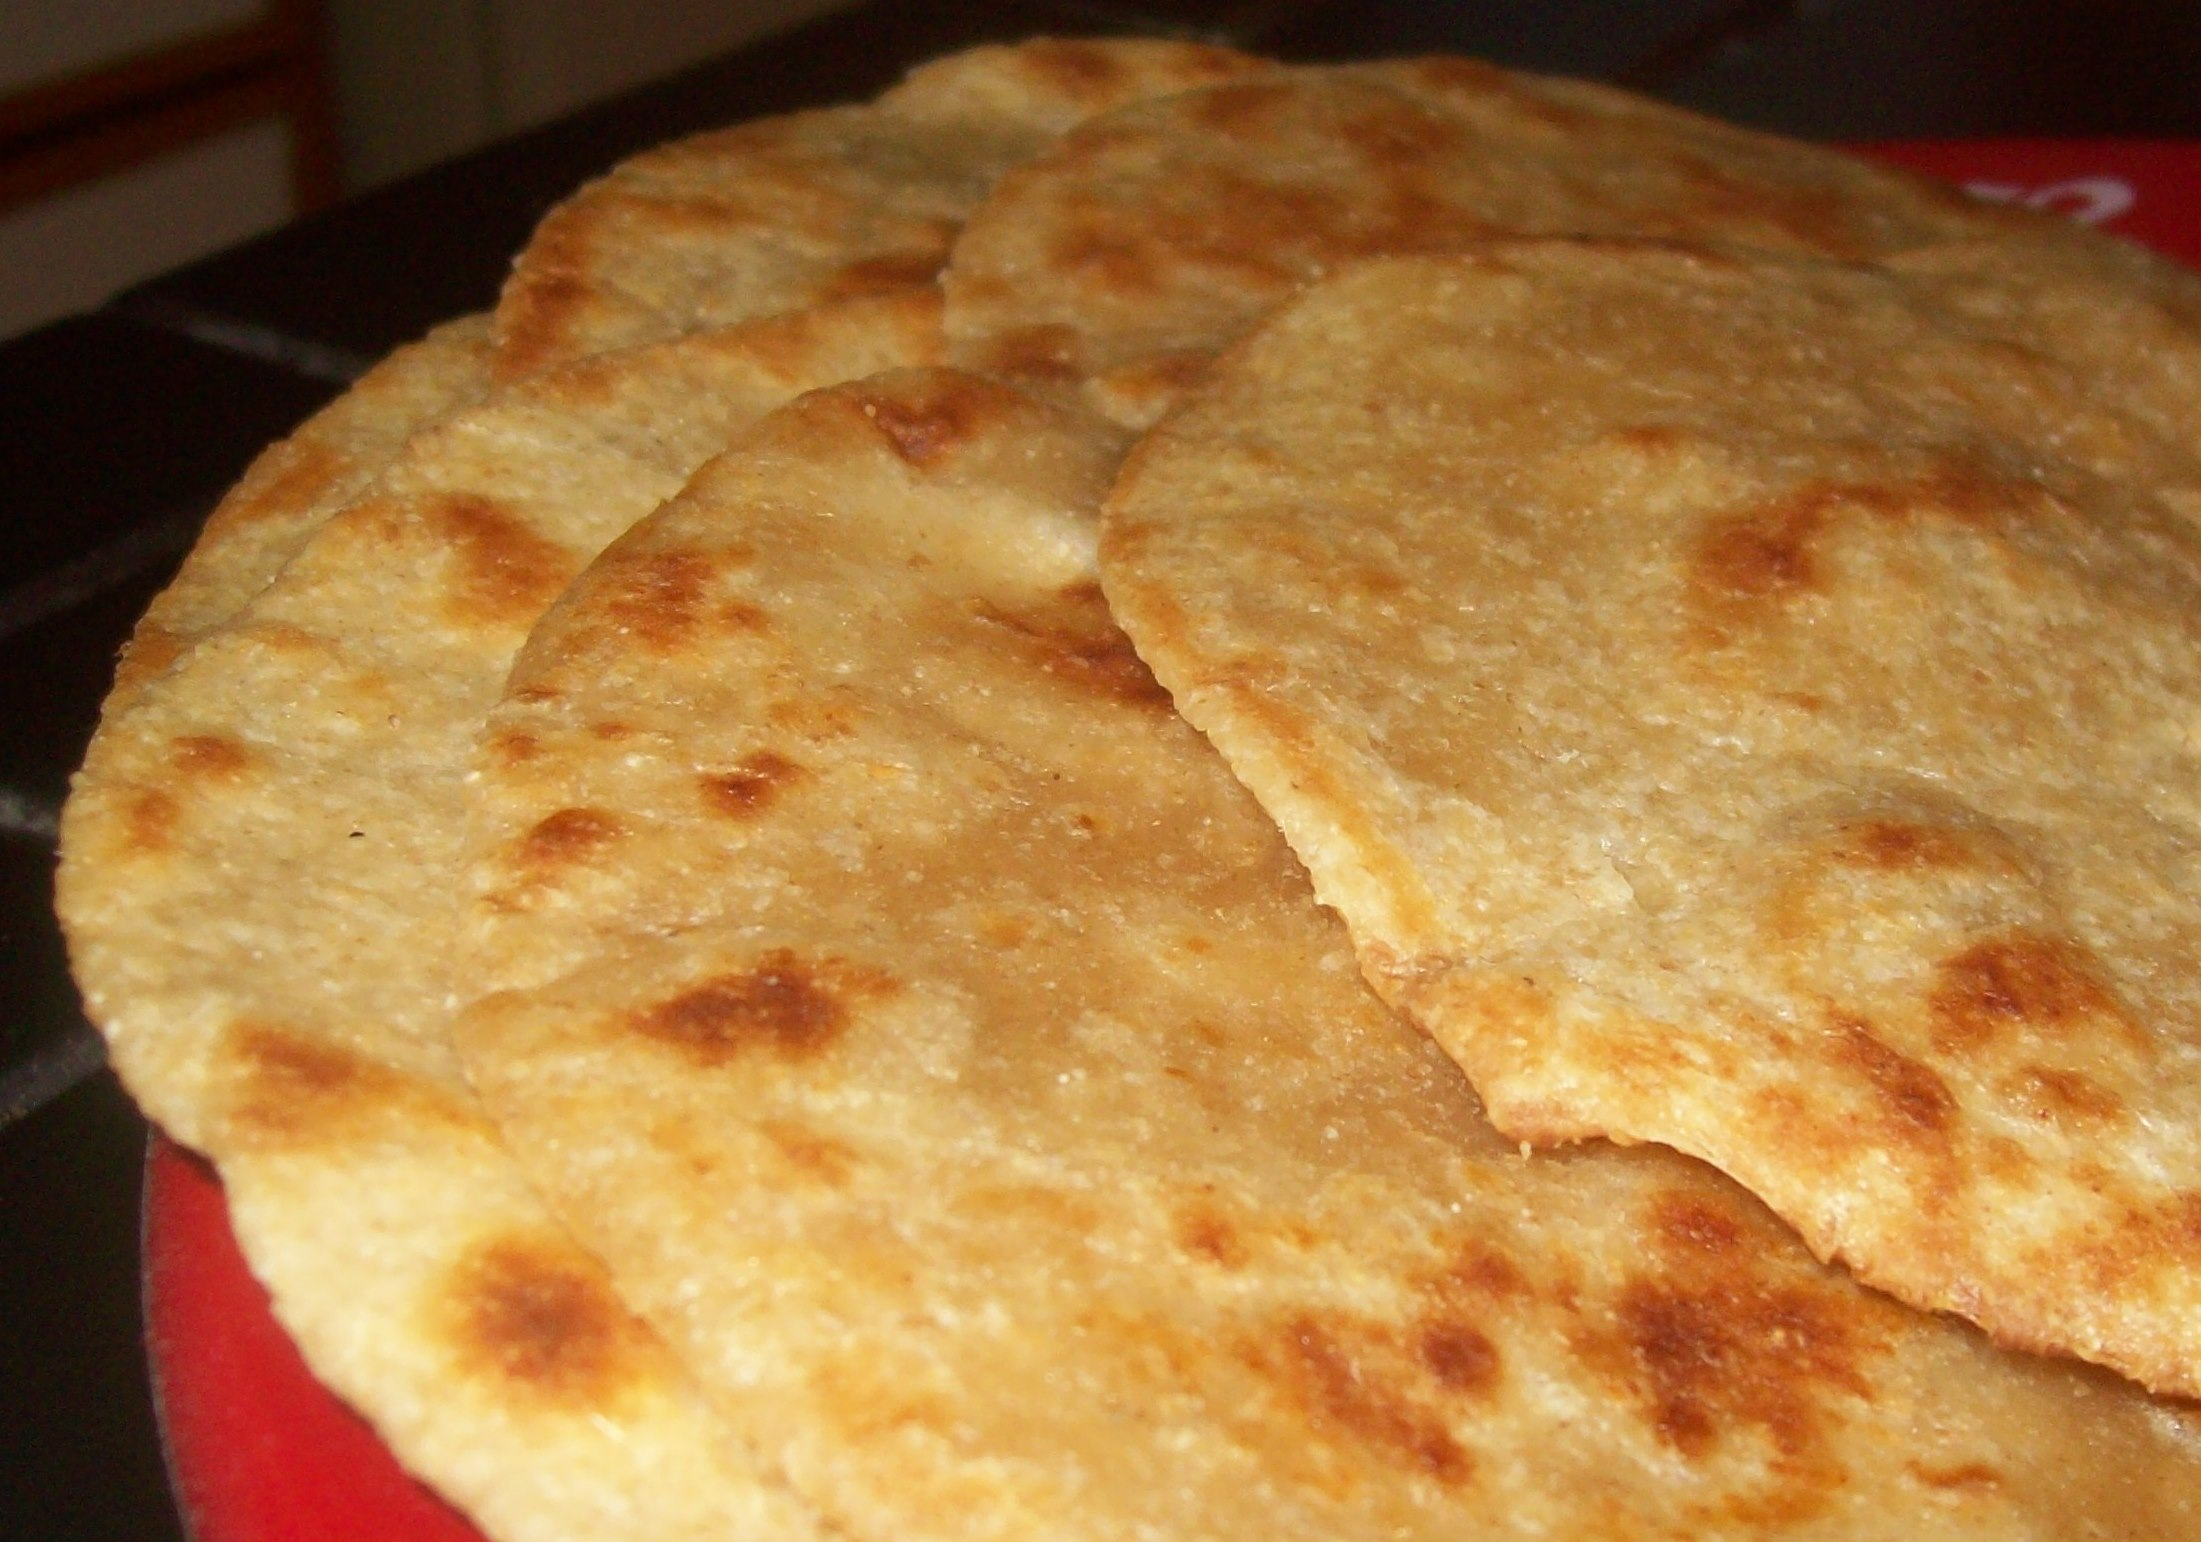 Crisp, fresh tortillas